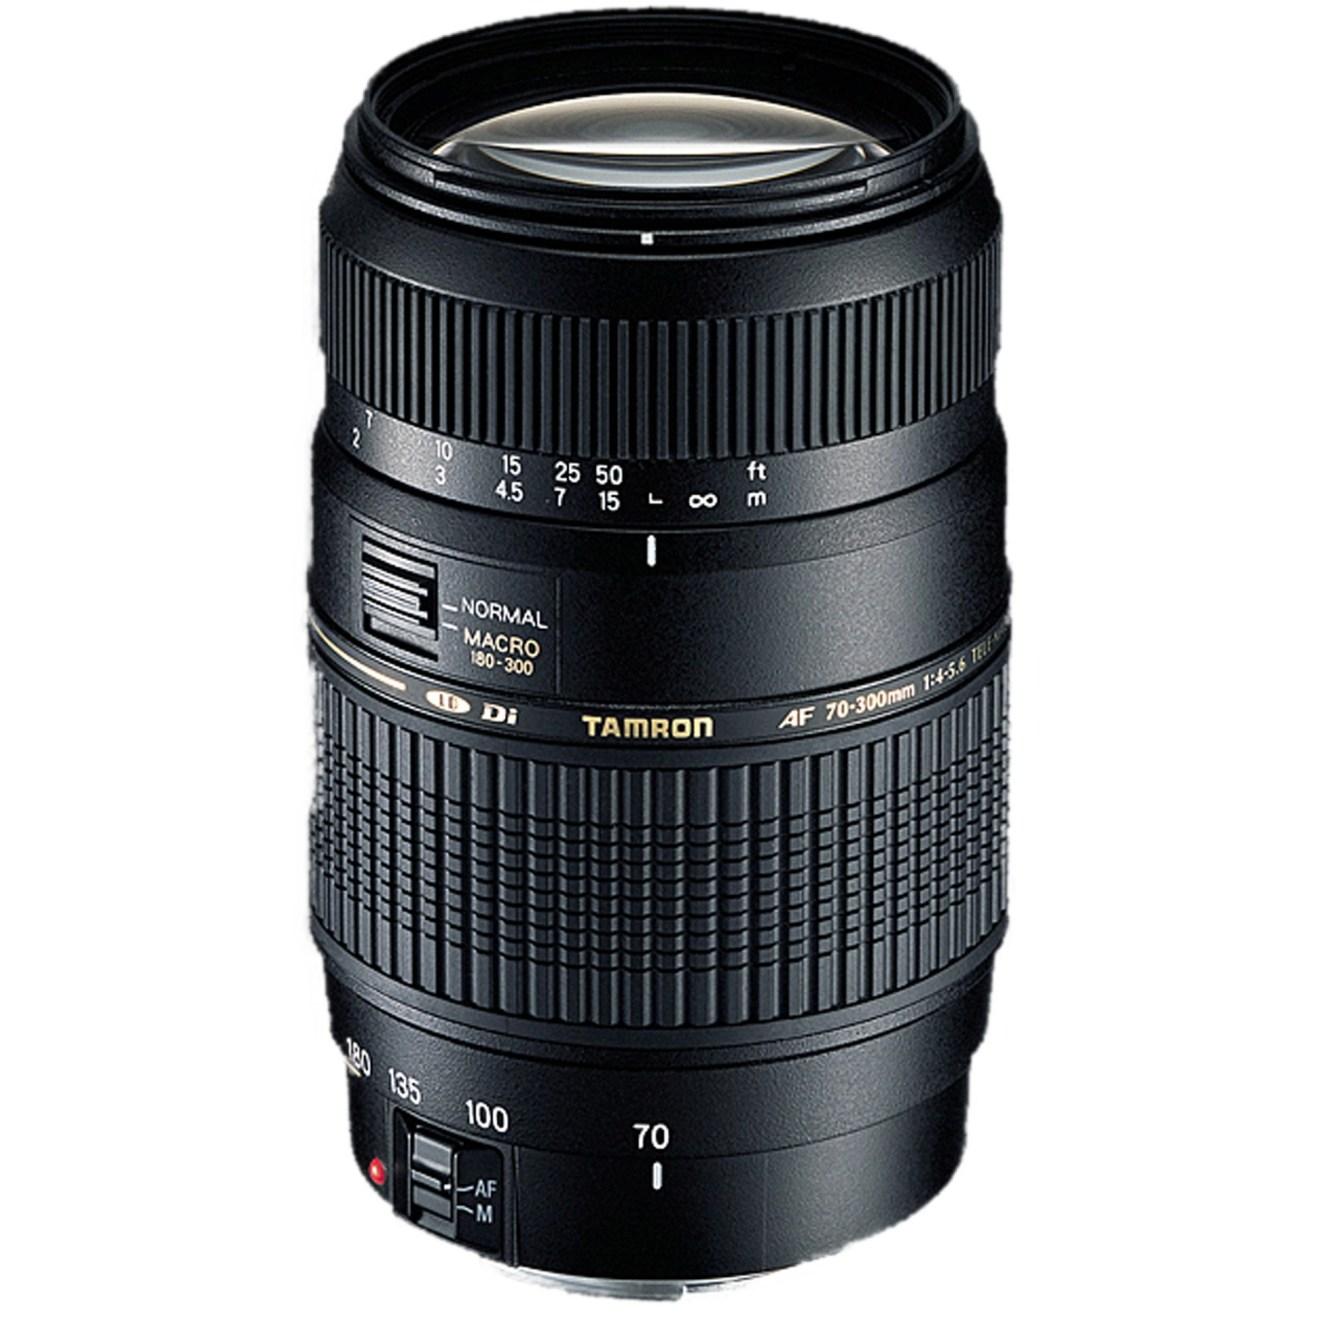 AF 70-300mm F/4-5.6 Di LD MACRO 1:2 SLR Tele zoom lens Noir, Lentille Sony a6300 Sony a6300 Bundle Tamron AF 70 300mm F 4 5 6 Di LD MACRO 1 2 SLR Tele zoom lens Noir  Lentille  mjot09